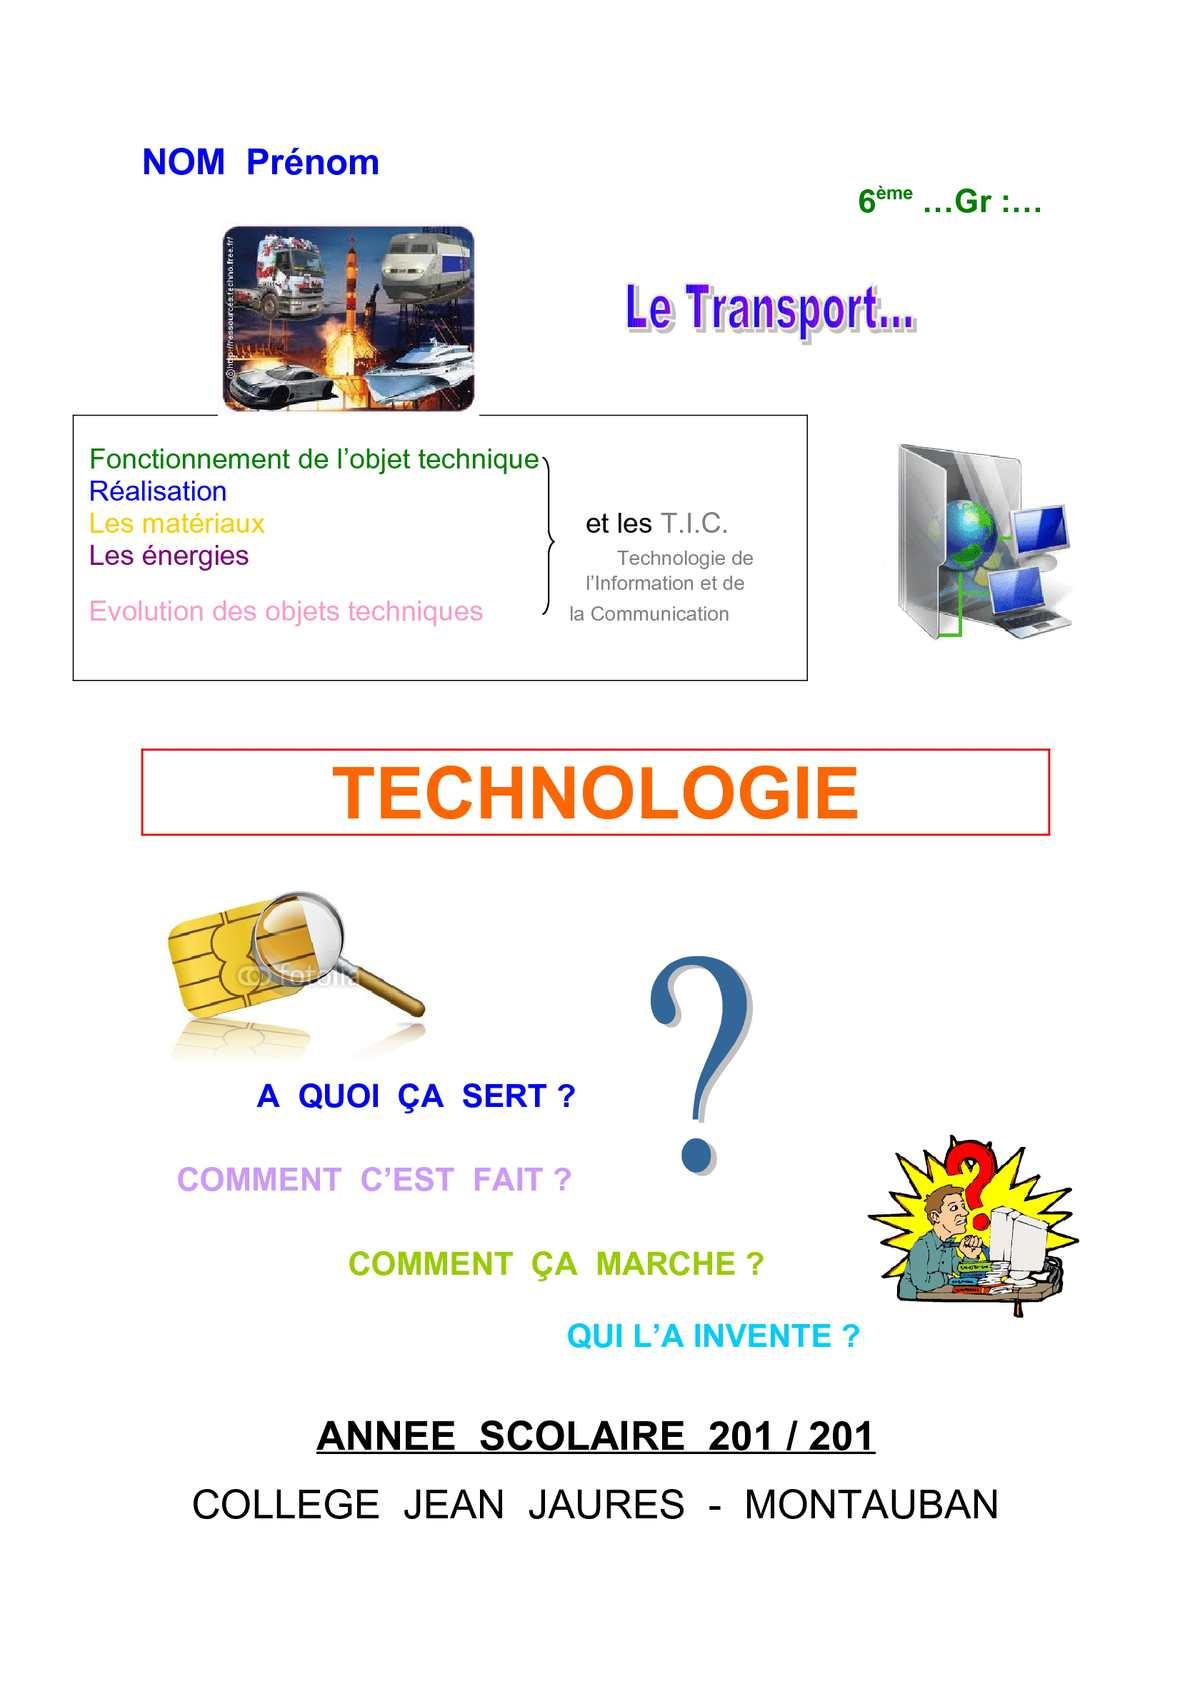 calam233o classeur technologie niveau 6232me